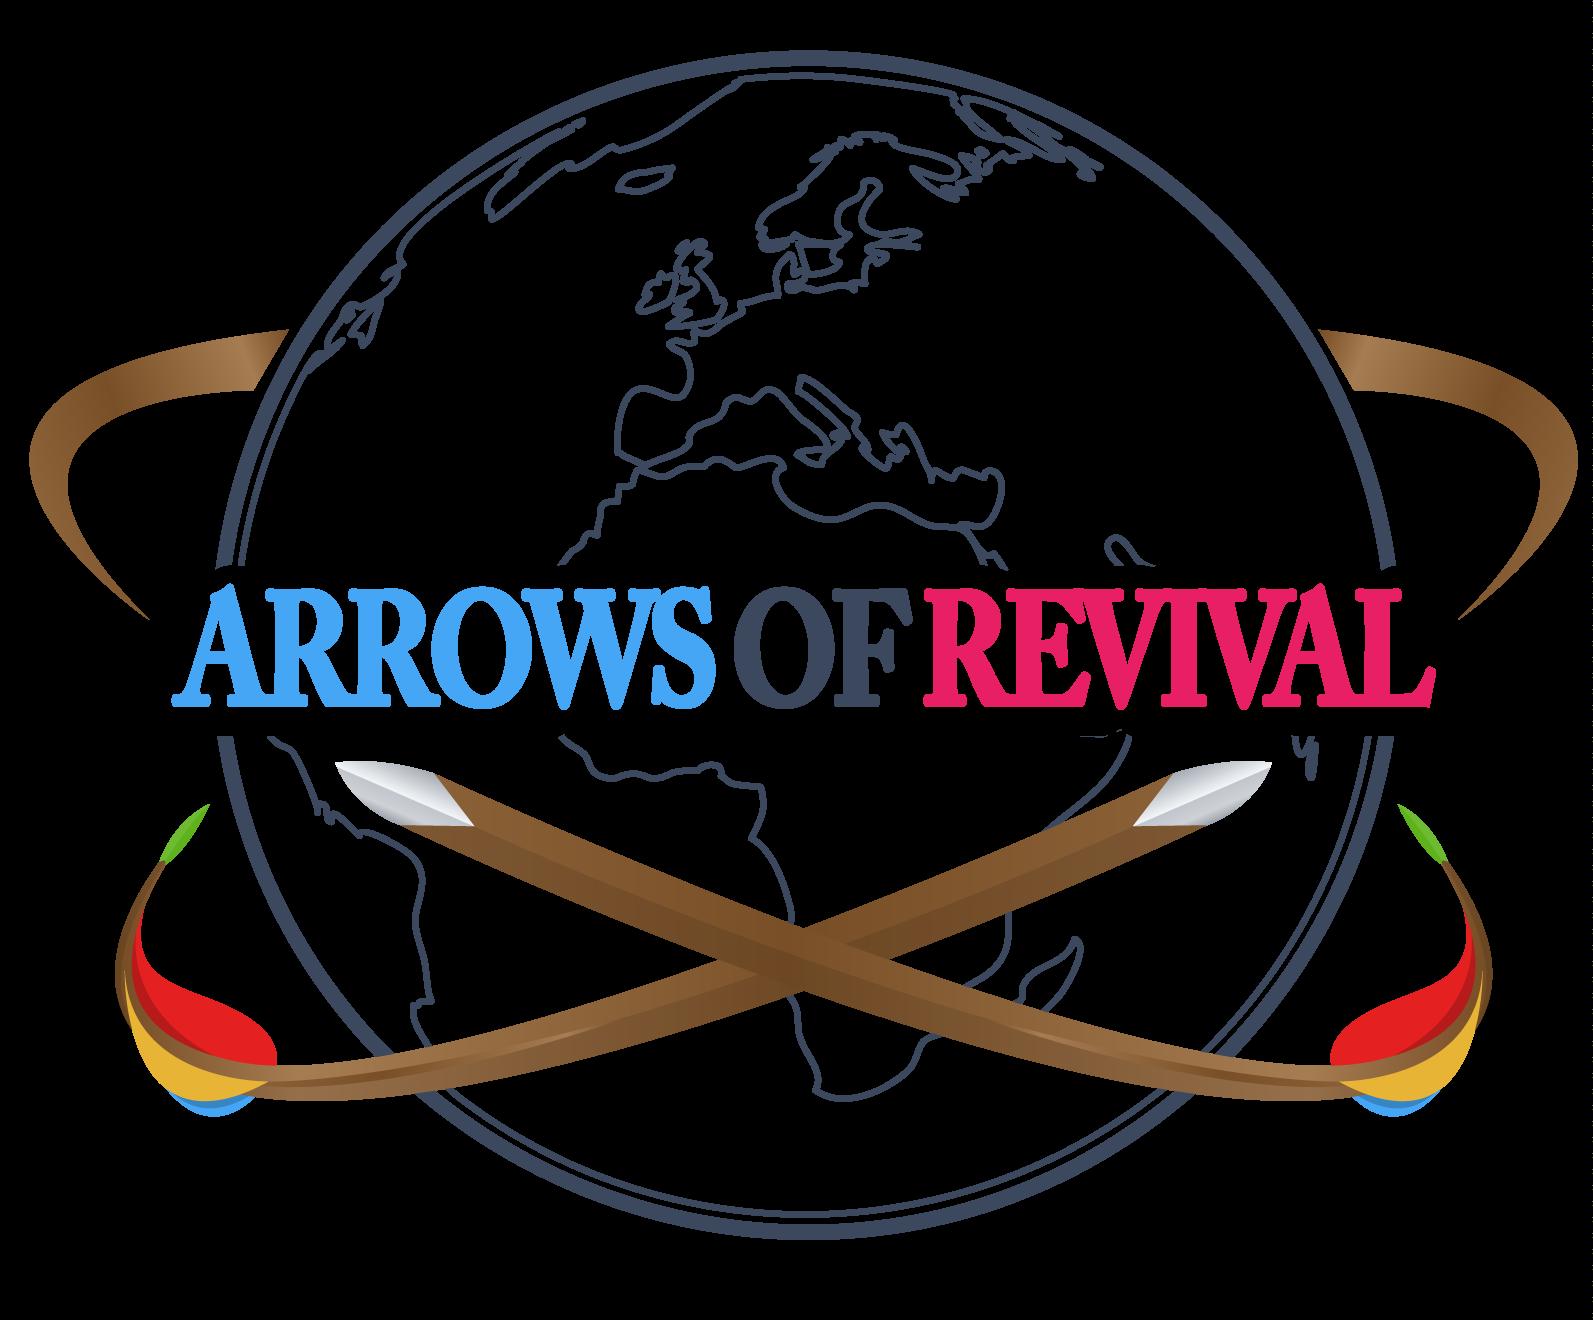 ArrowsofRevival1300dpiRGB.png